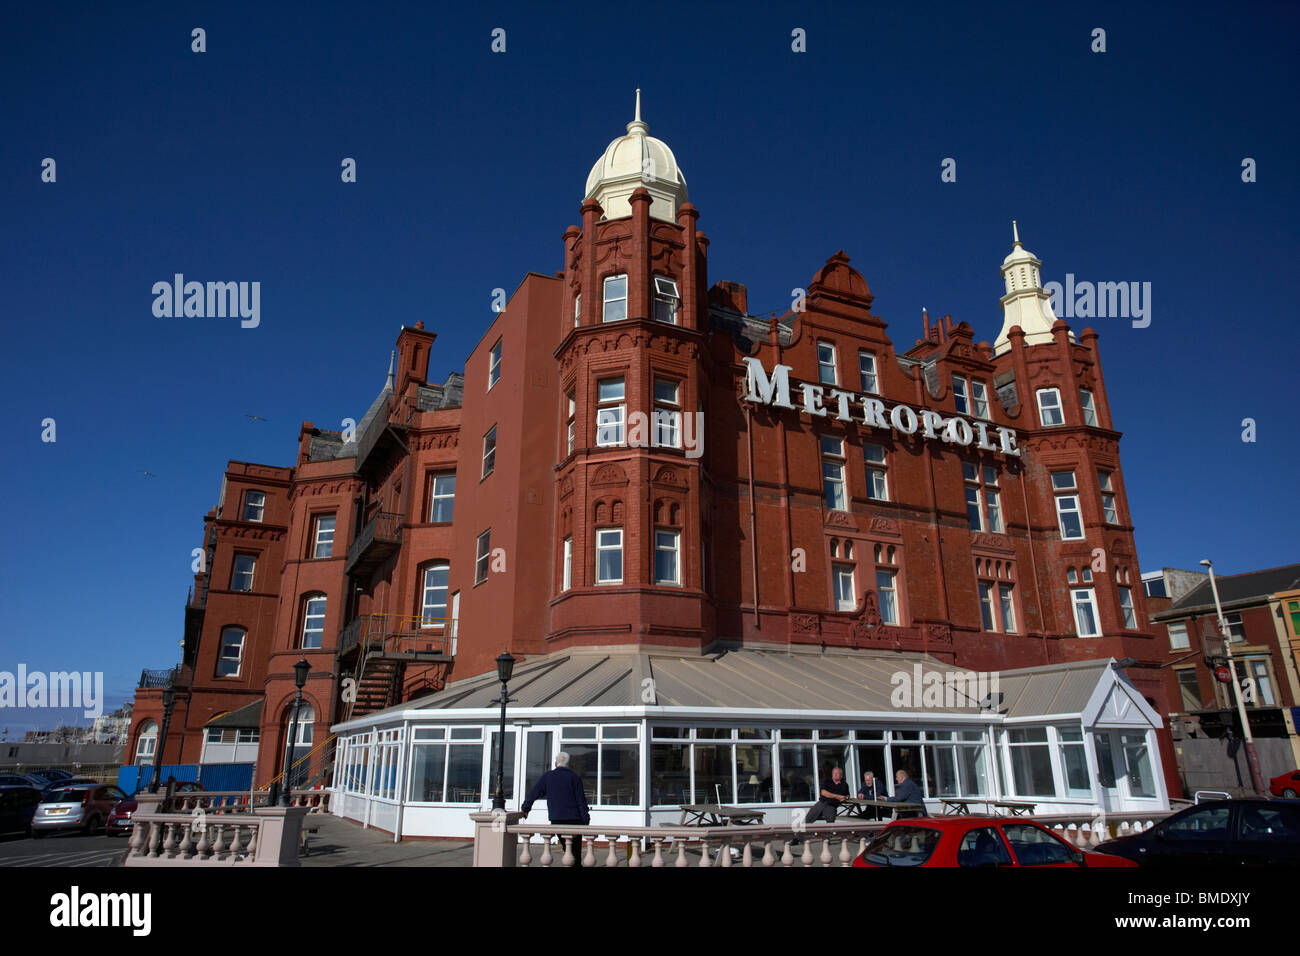 das grand Metropole Hotel Blackpool Promenade Lancashire England uk Stockbild